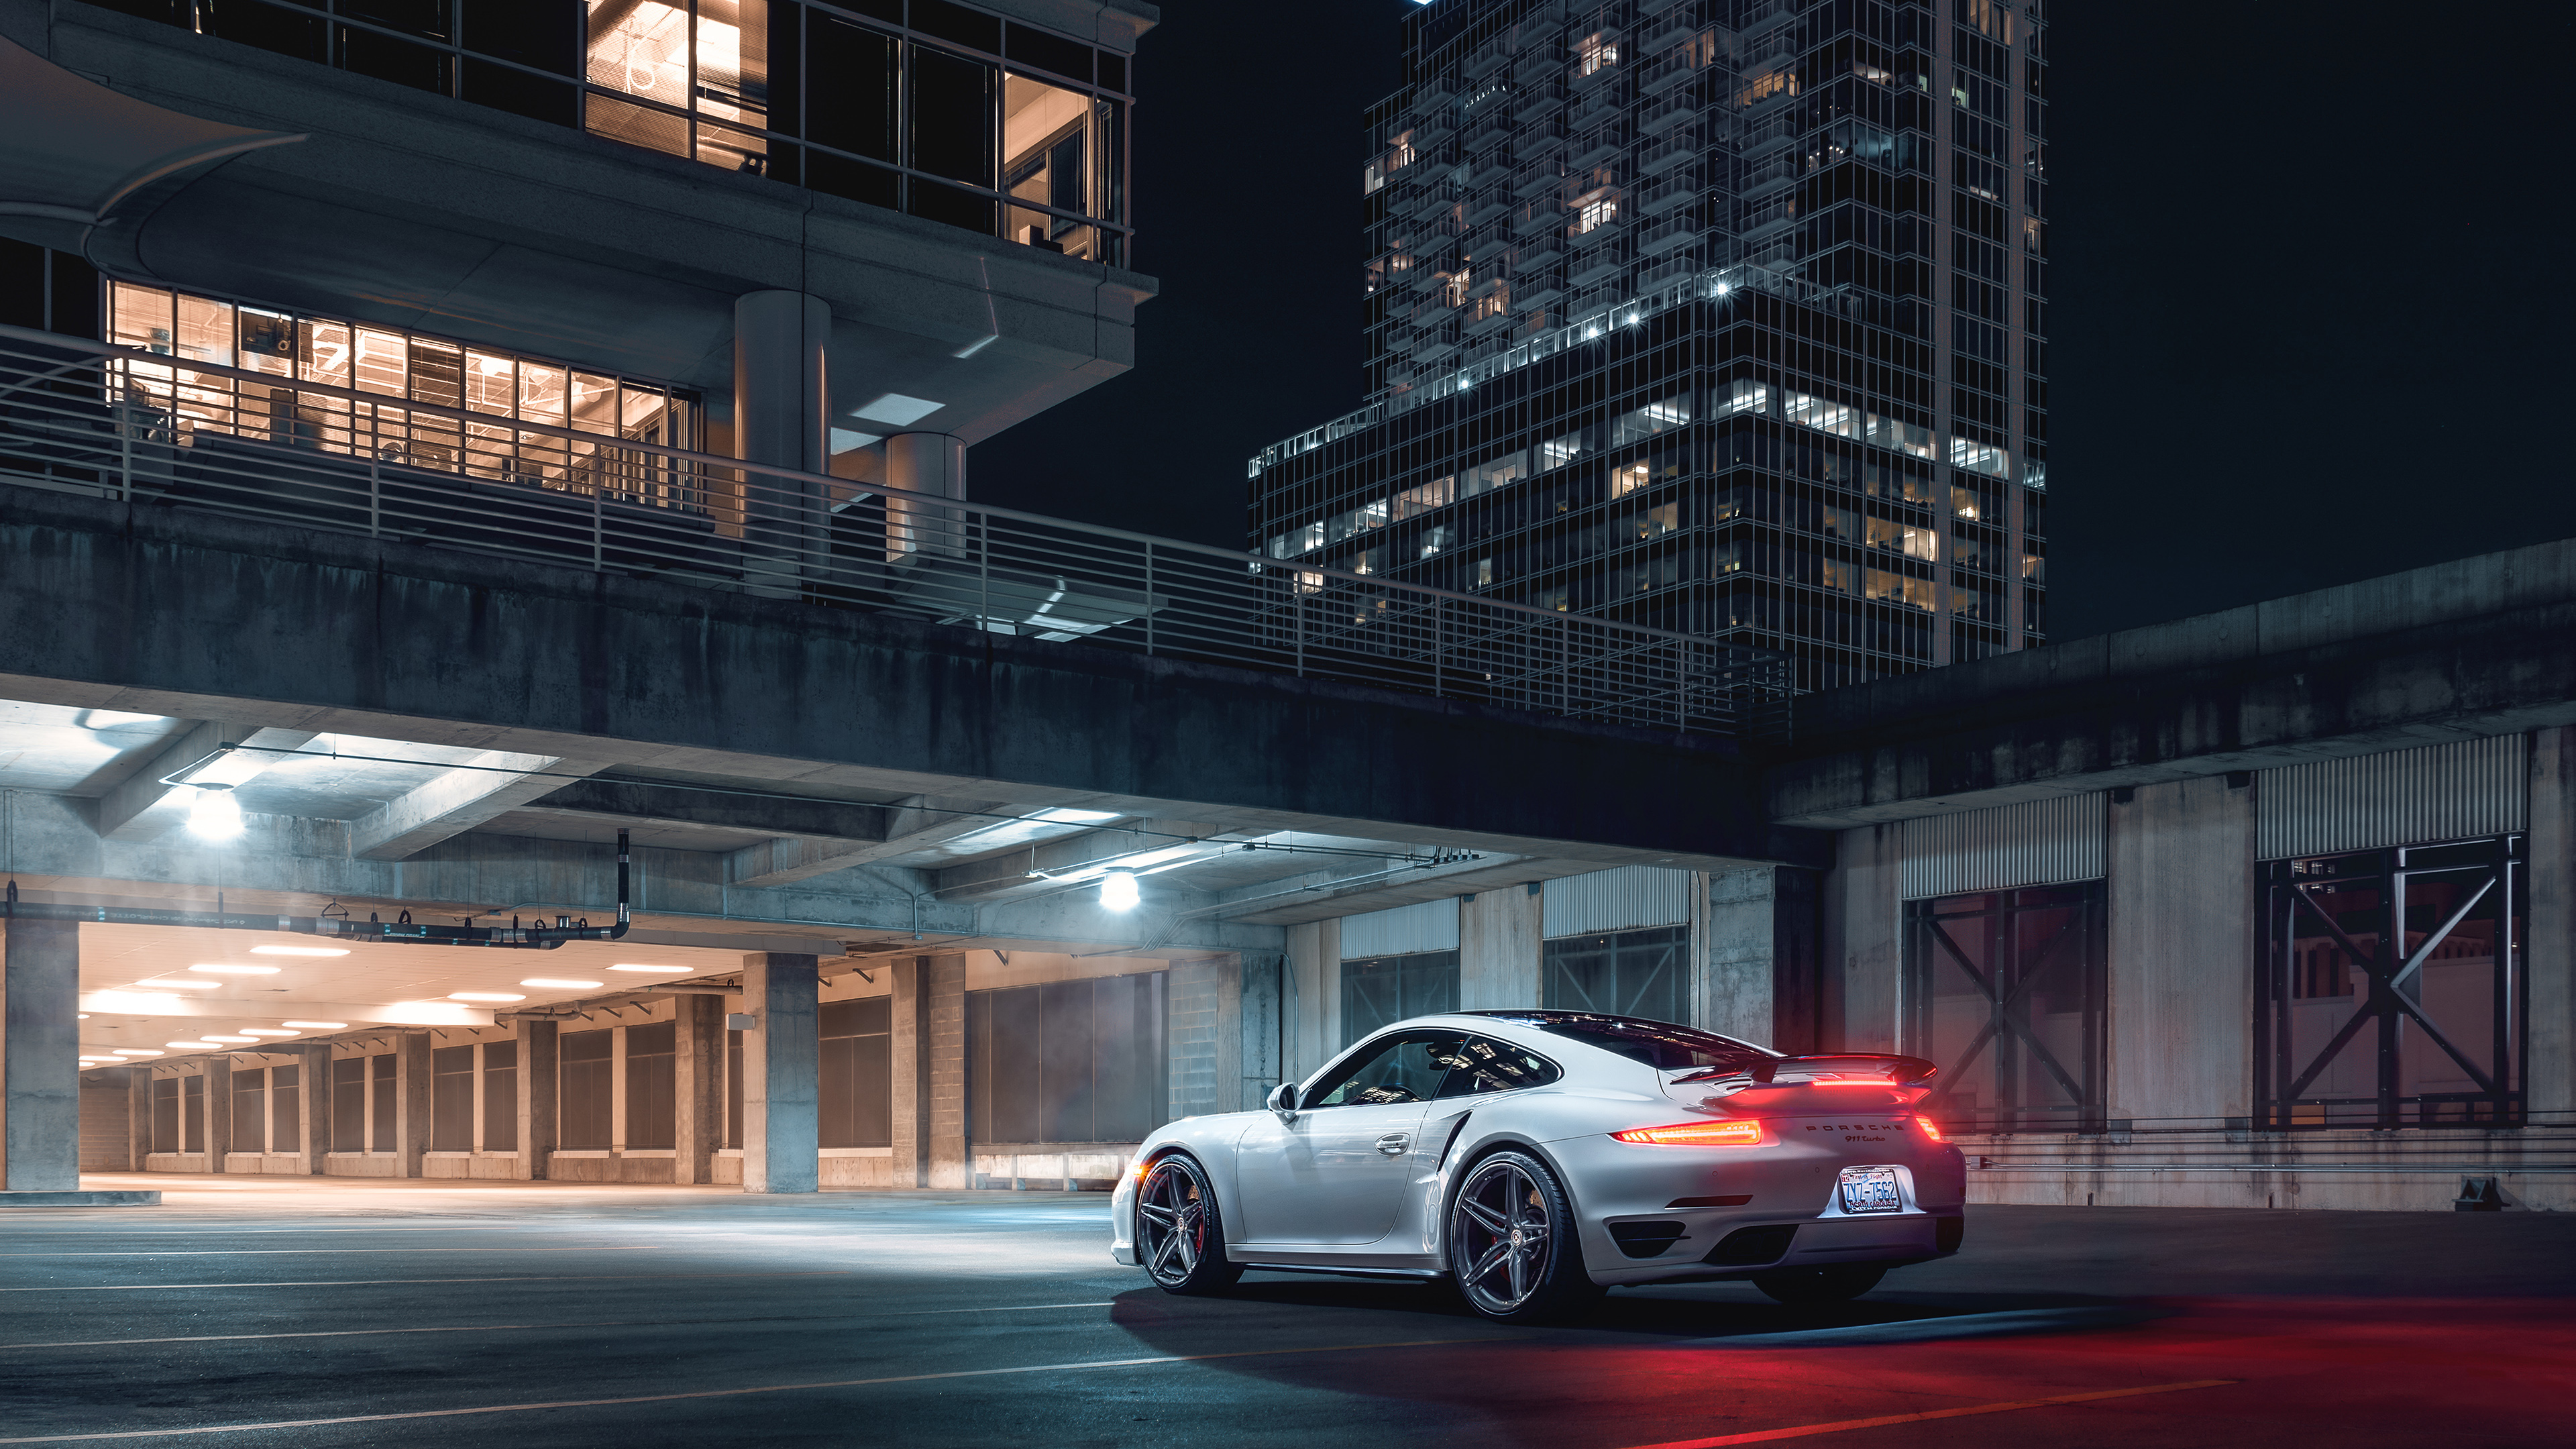 Porsche 911 White 2019 4k Hd Cars 4k Wallpapers Images